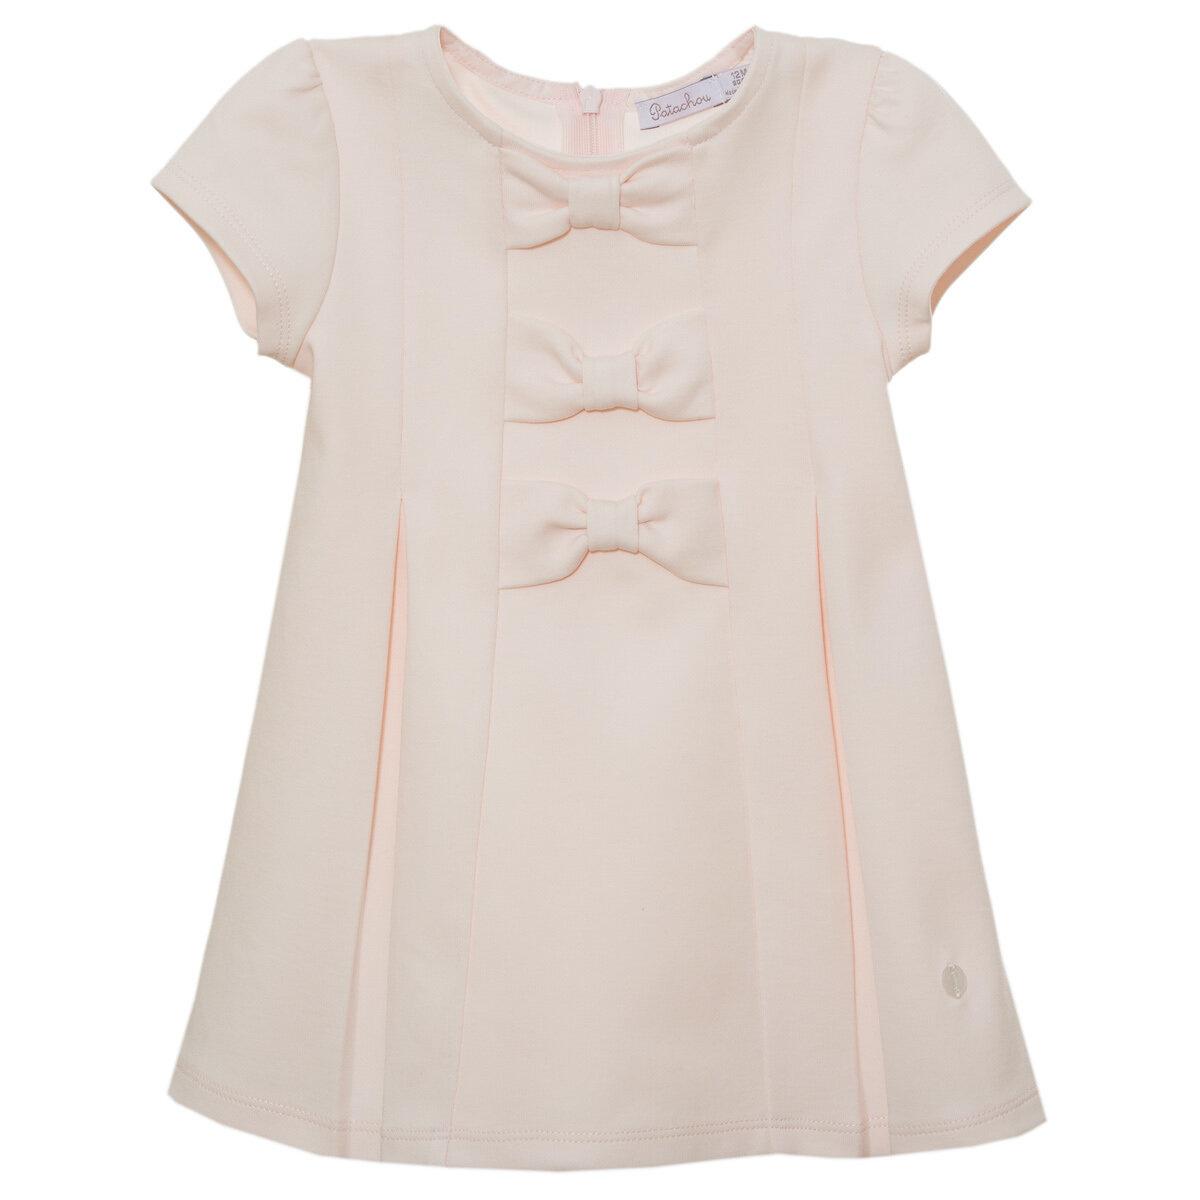 Patachou Patachou Bow Knit Dress 3205 SS21